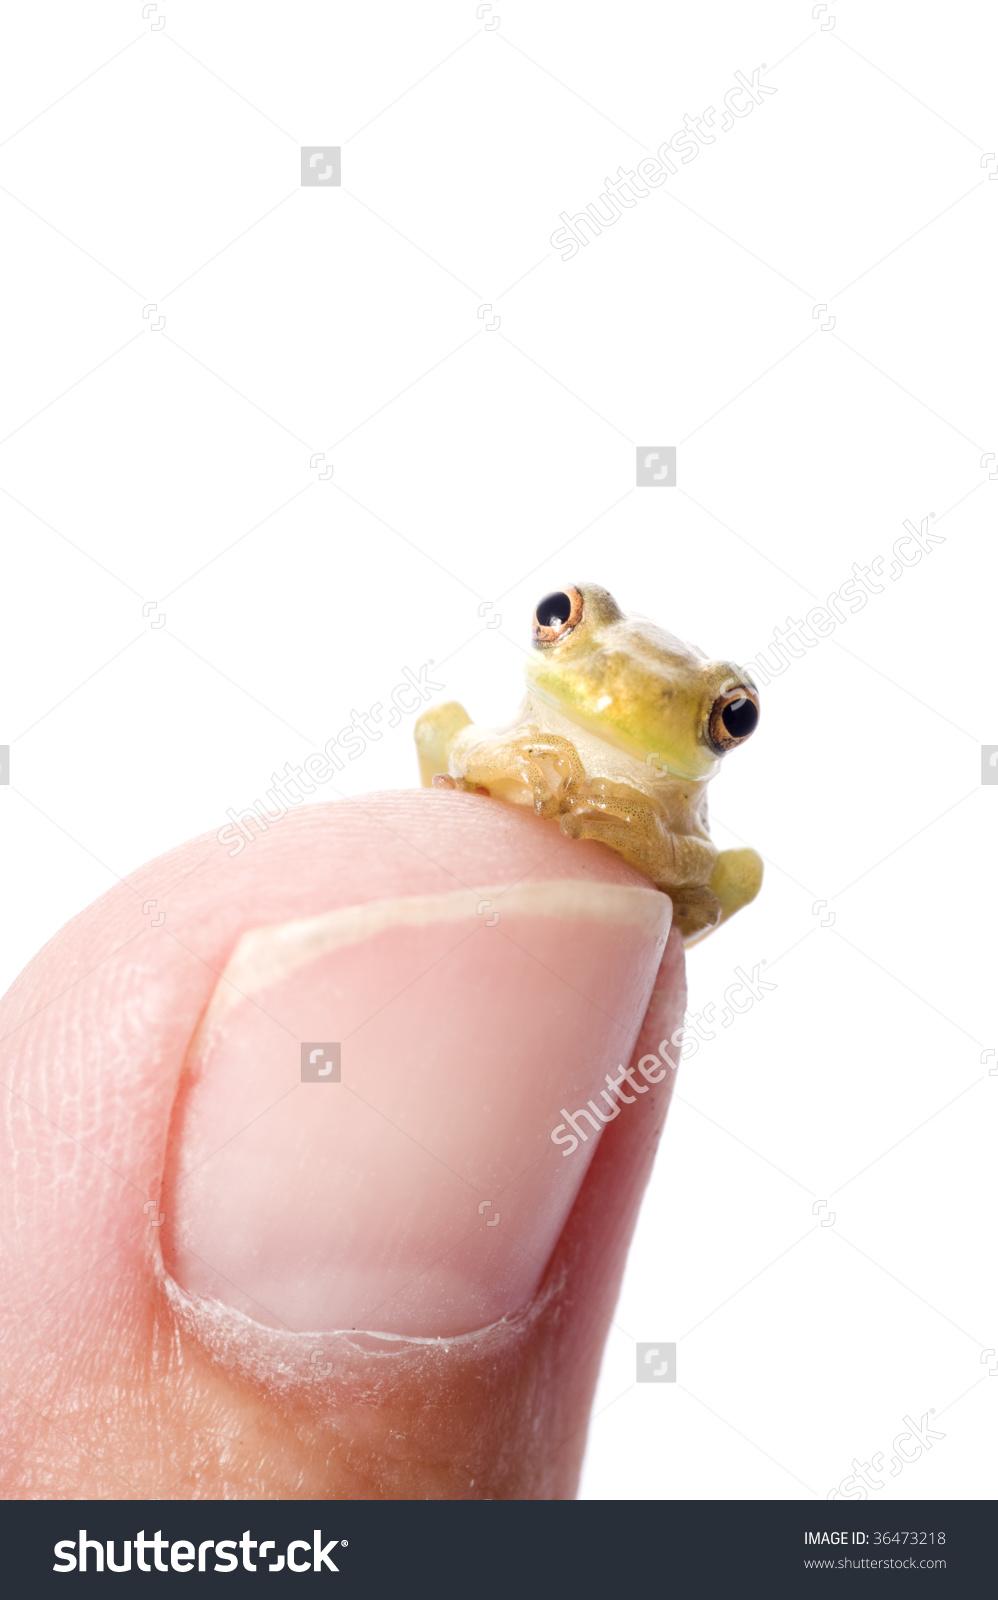 Humorous Pose Baby Cuban Tree Frog Stock Photo 36473218.